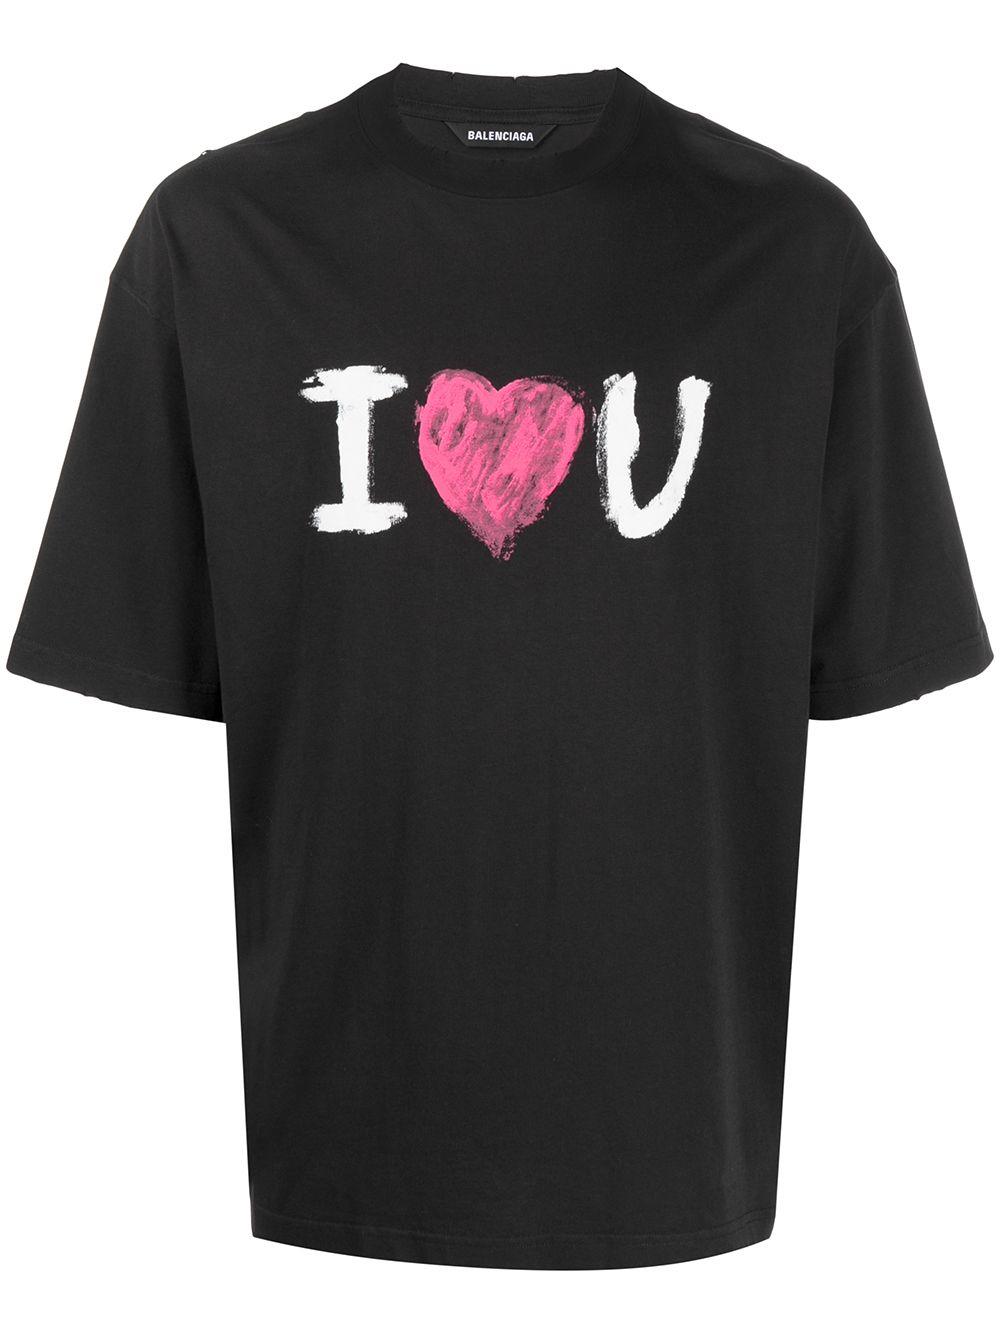 Picture of Balenciaga | I Love You Print T-Shirt